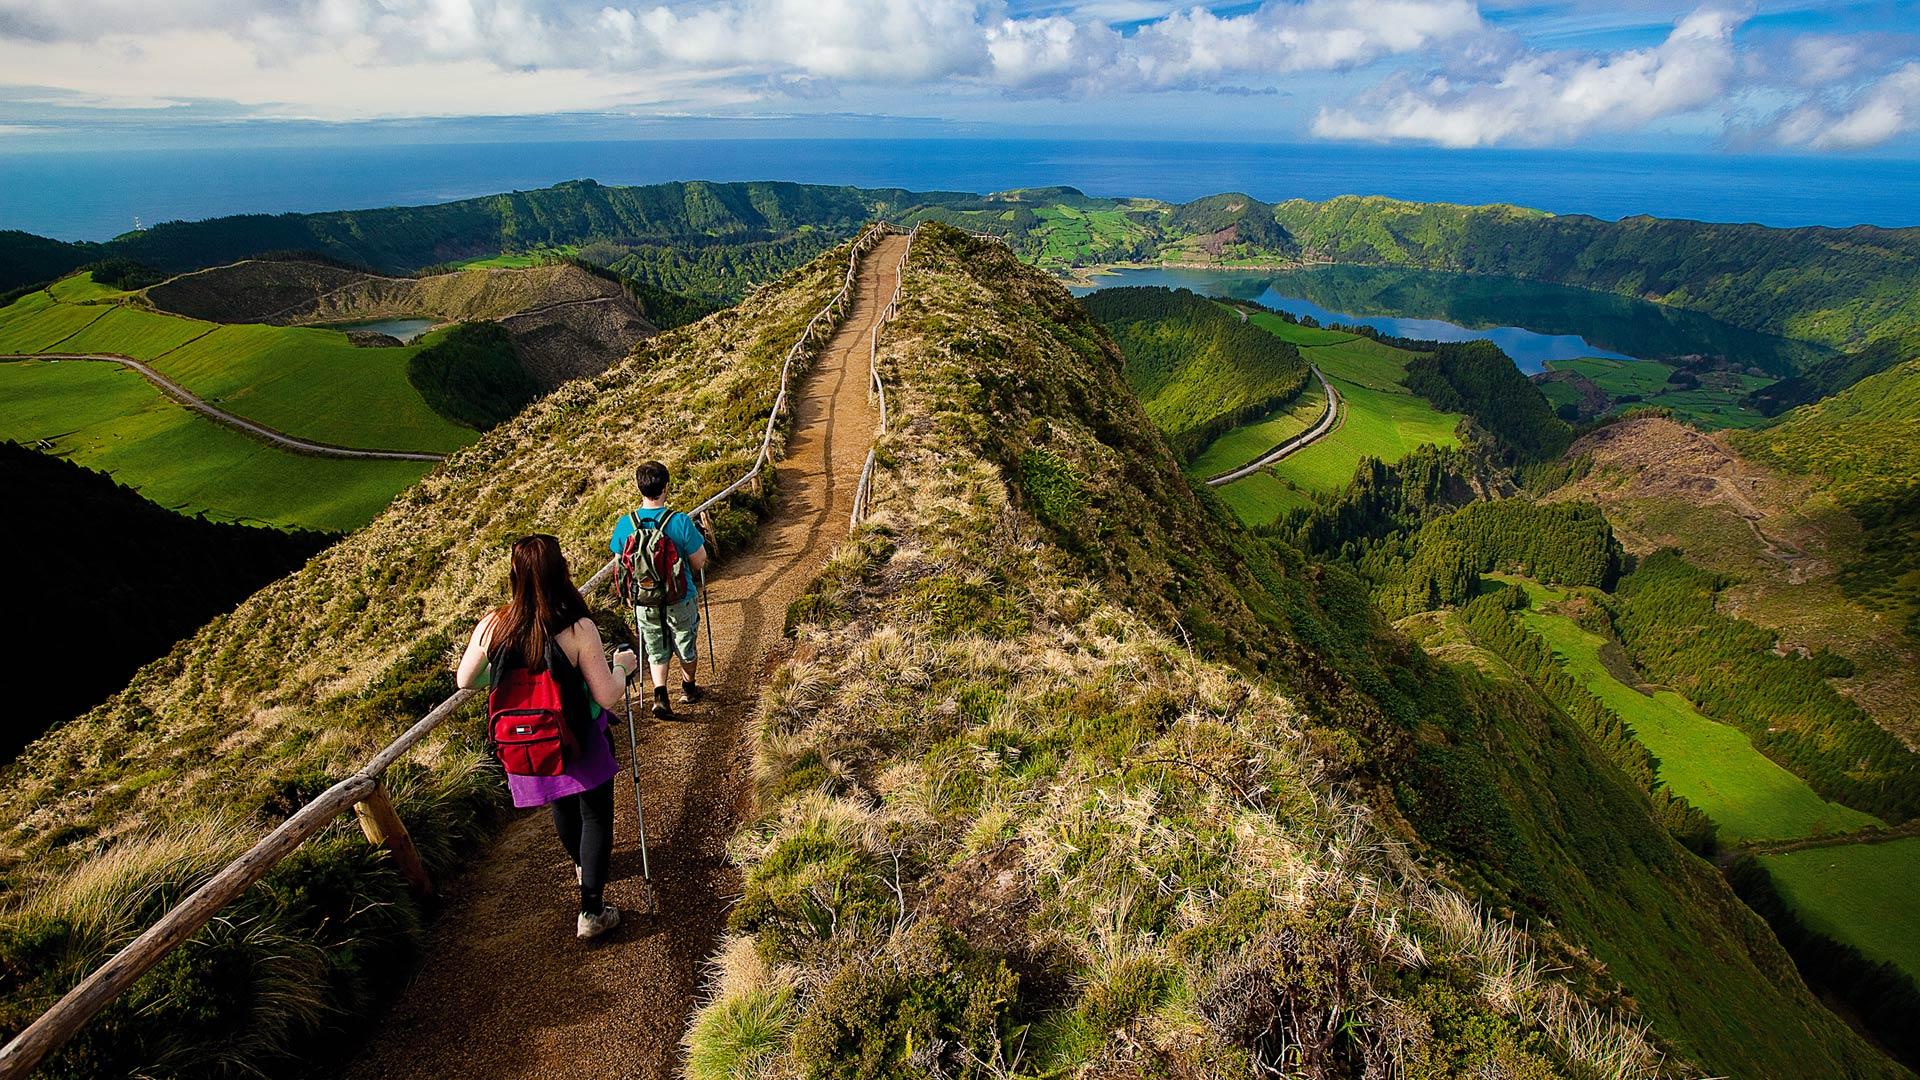 Vista do Rei, isla de Sao Miguel, Azores